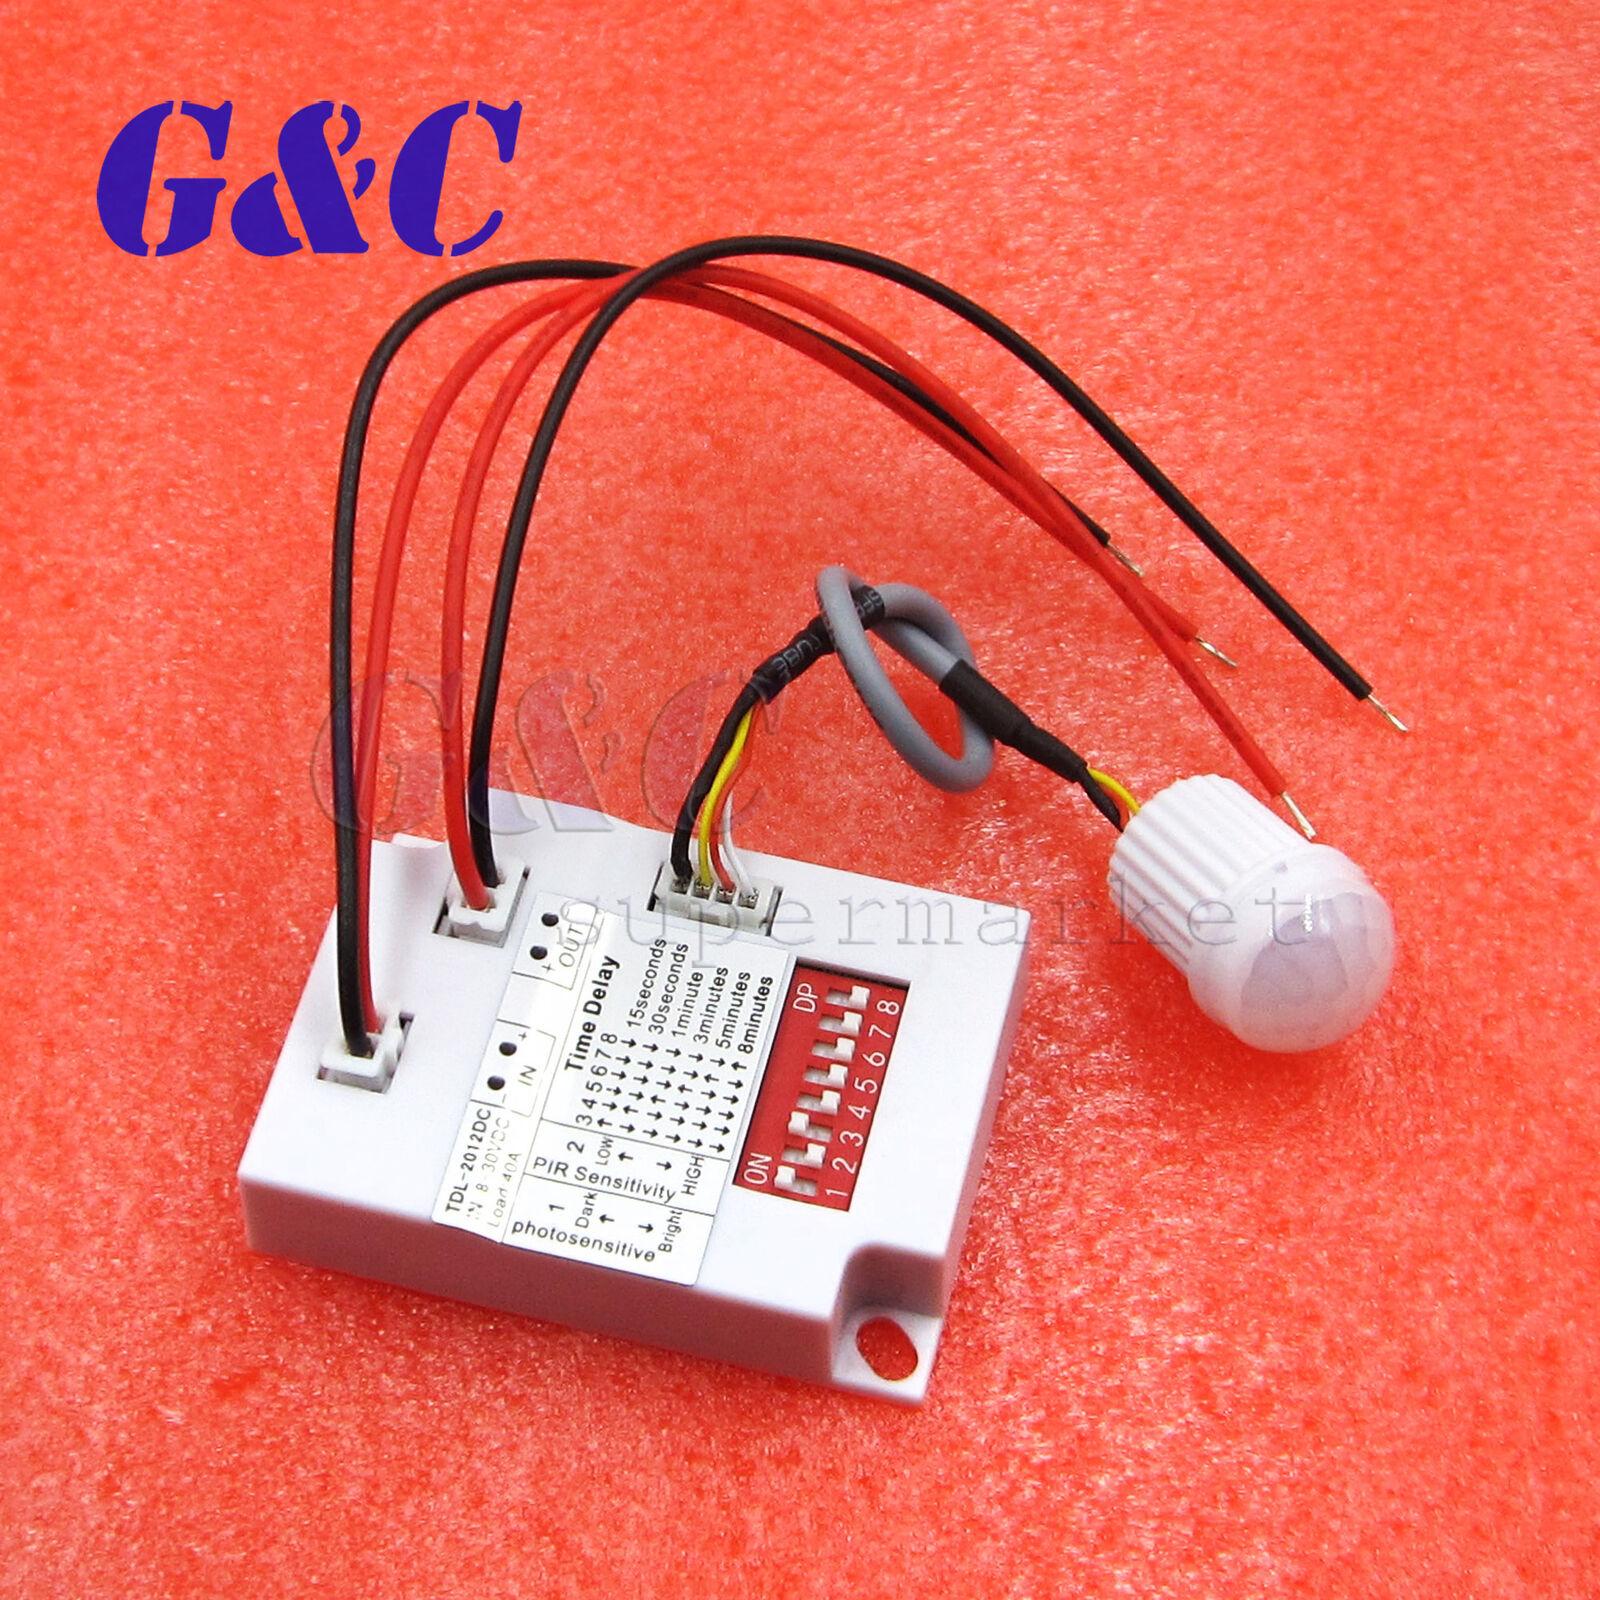 Plastic Intelligent Light Body IR Motion Sensor Switch DC 8-30V TDL-2012 New